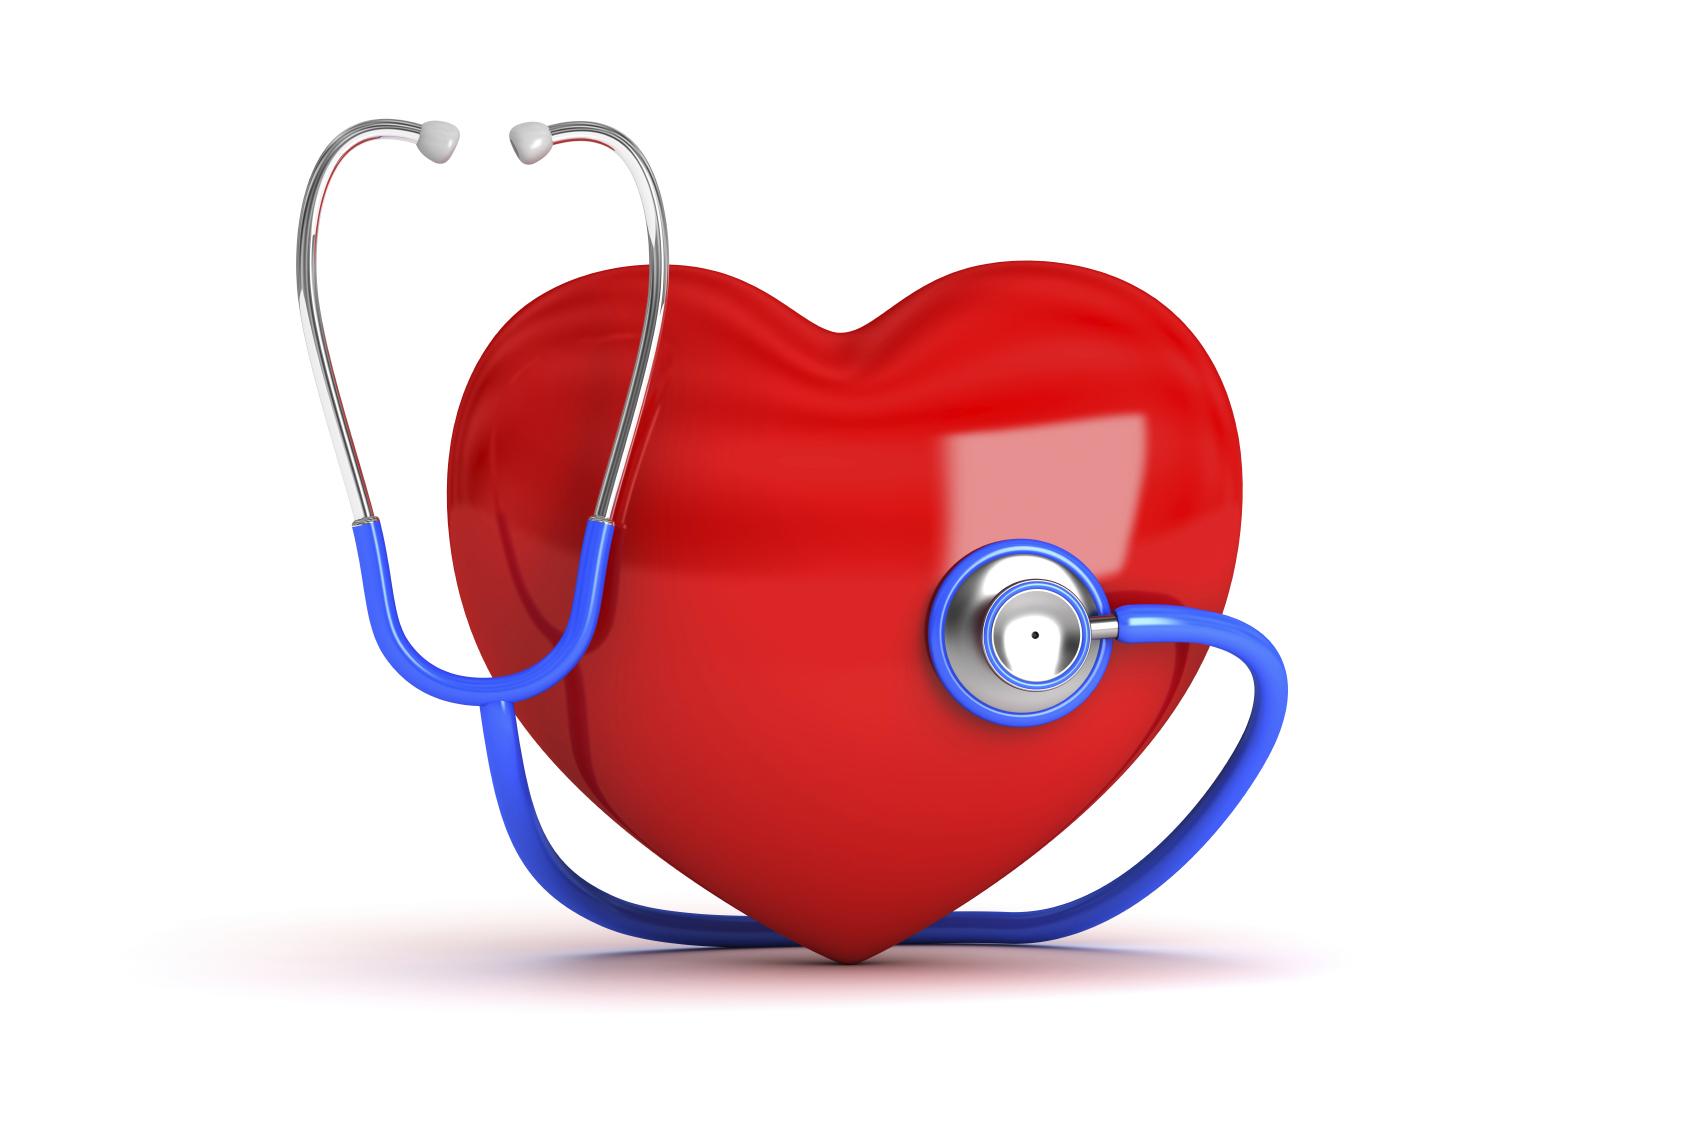 002 12 Children Essay Example Lifestyle And Cardiac Beautiful Health Full